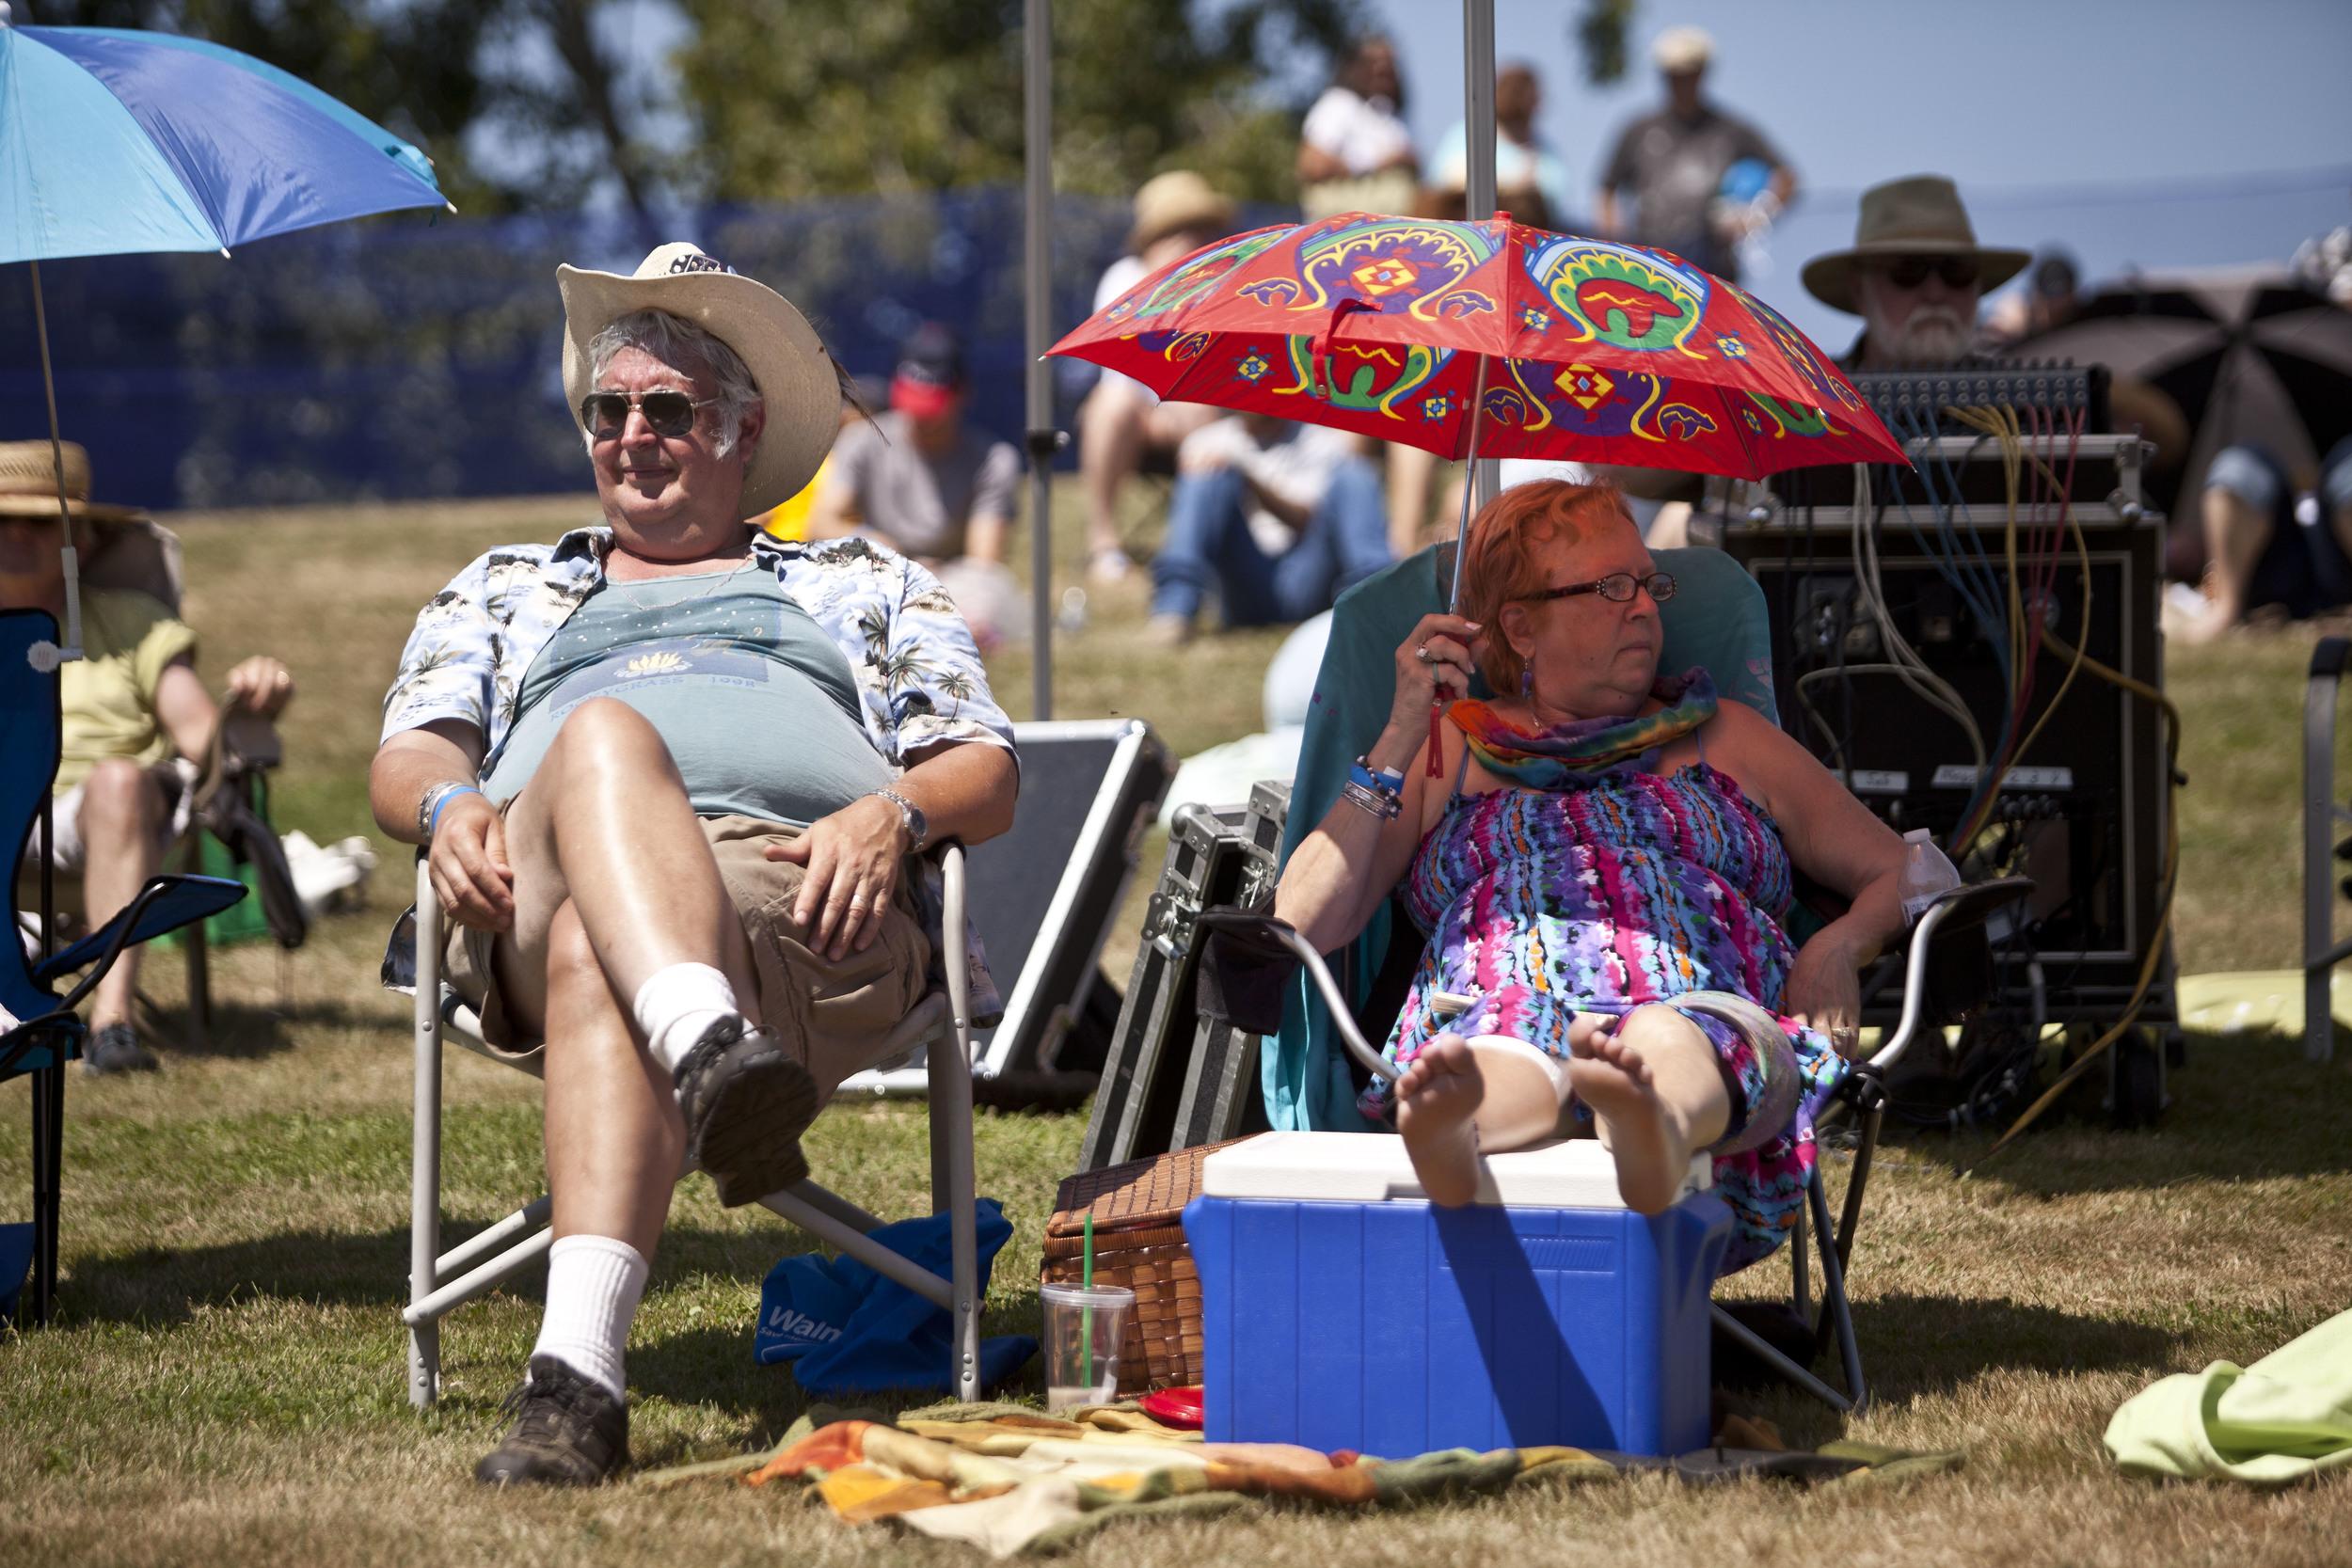 One couple enjoys the show at the 2014 Bainbridge Island Bluegrass Festival.